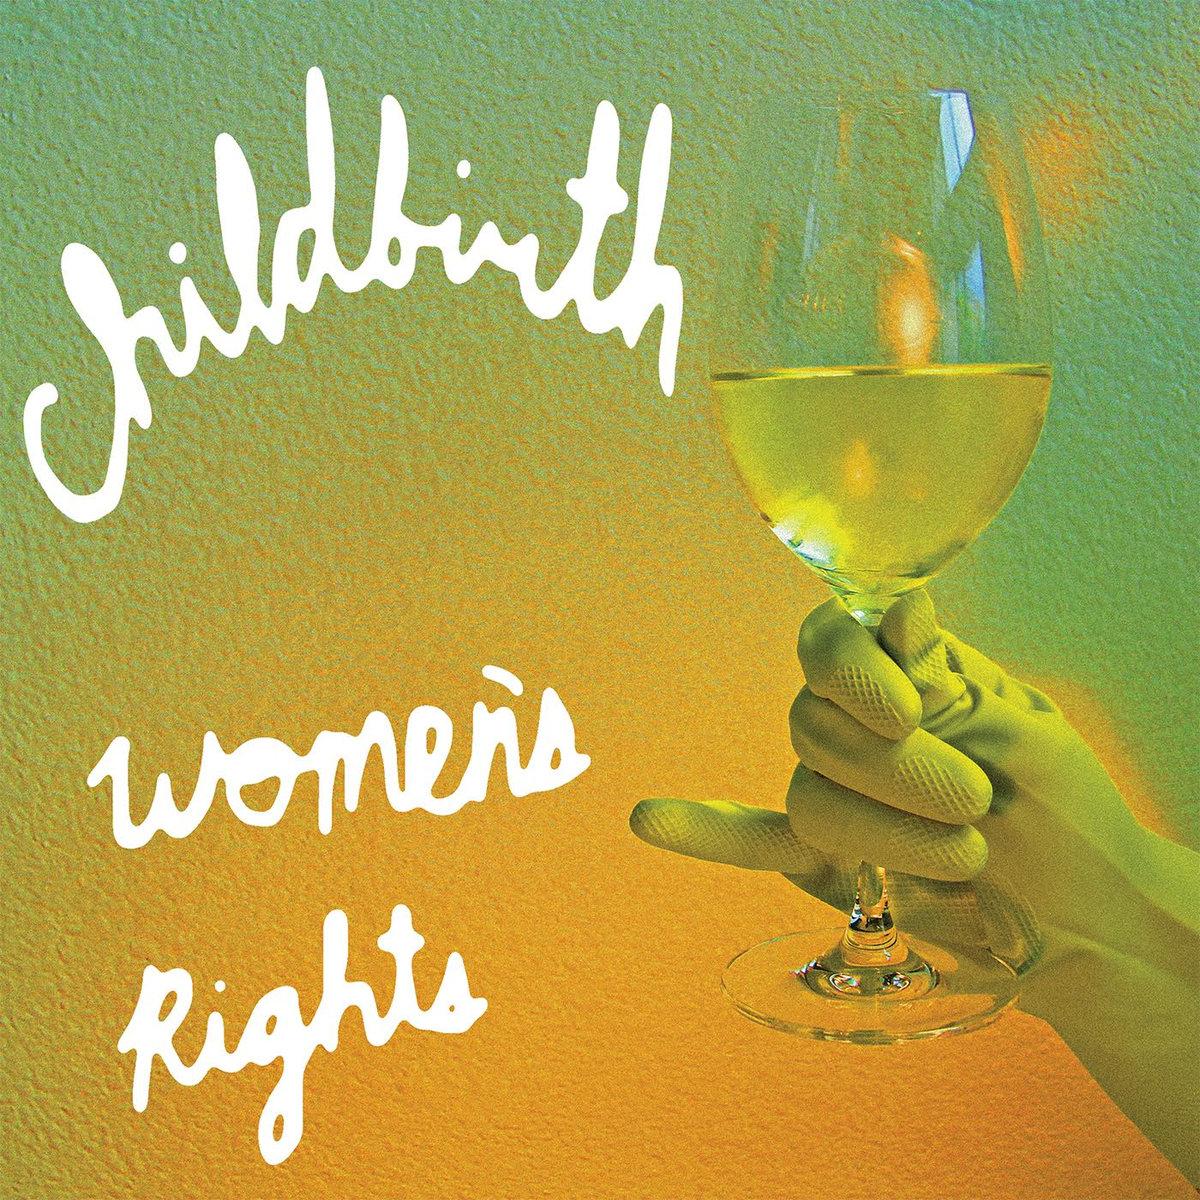 Childbirth's intriguing revolution in 'Women's Rights'